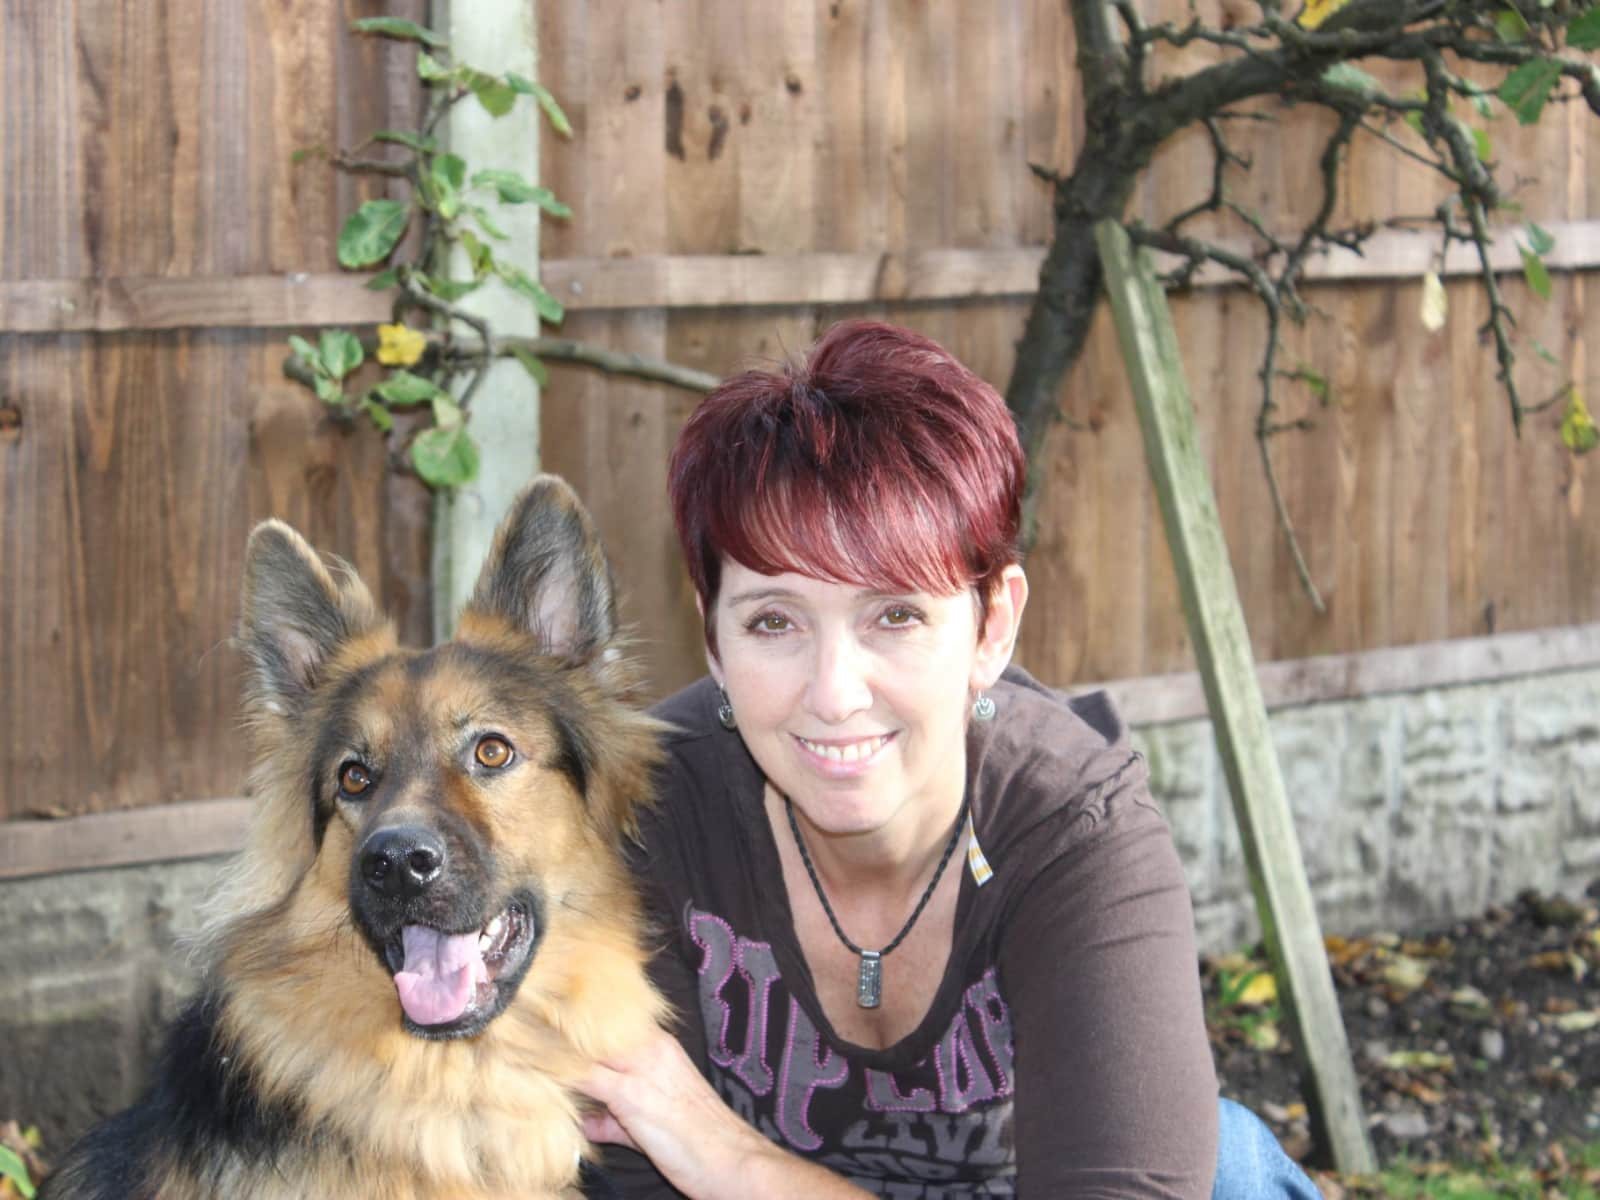 Julie from Birmingham, United Kingdom